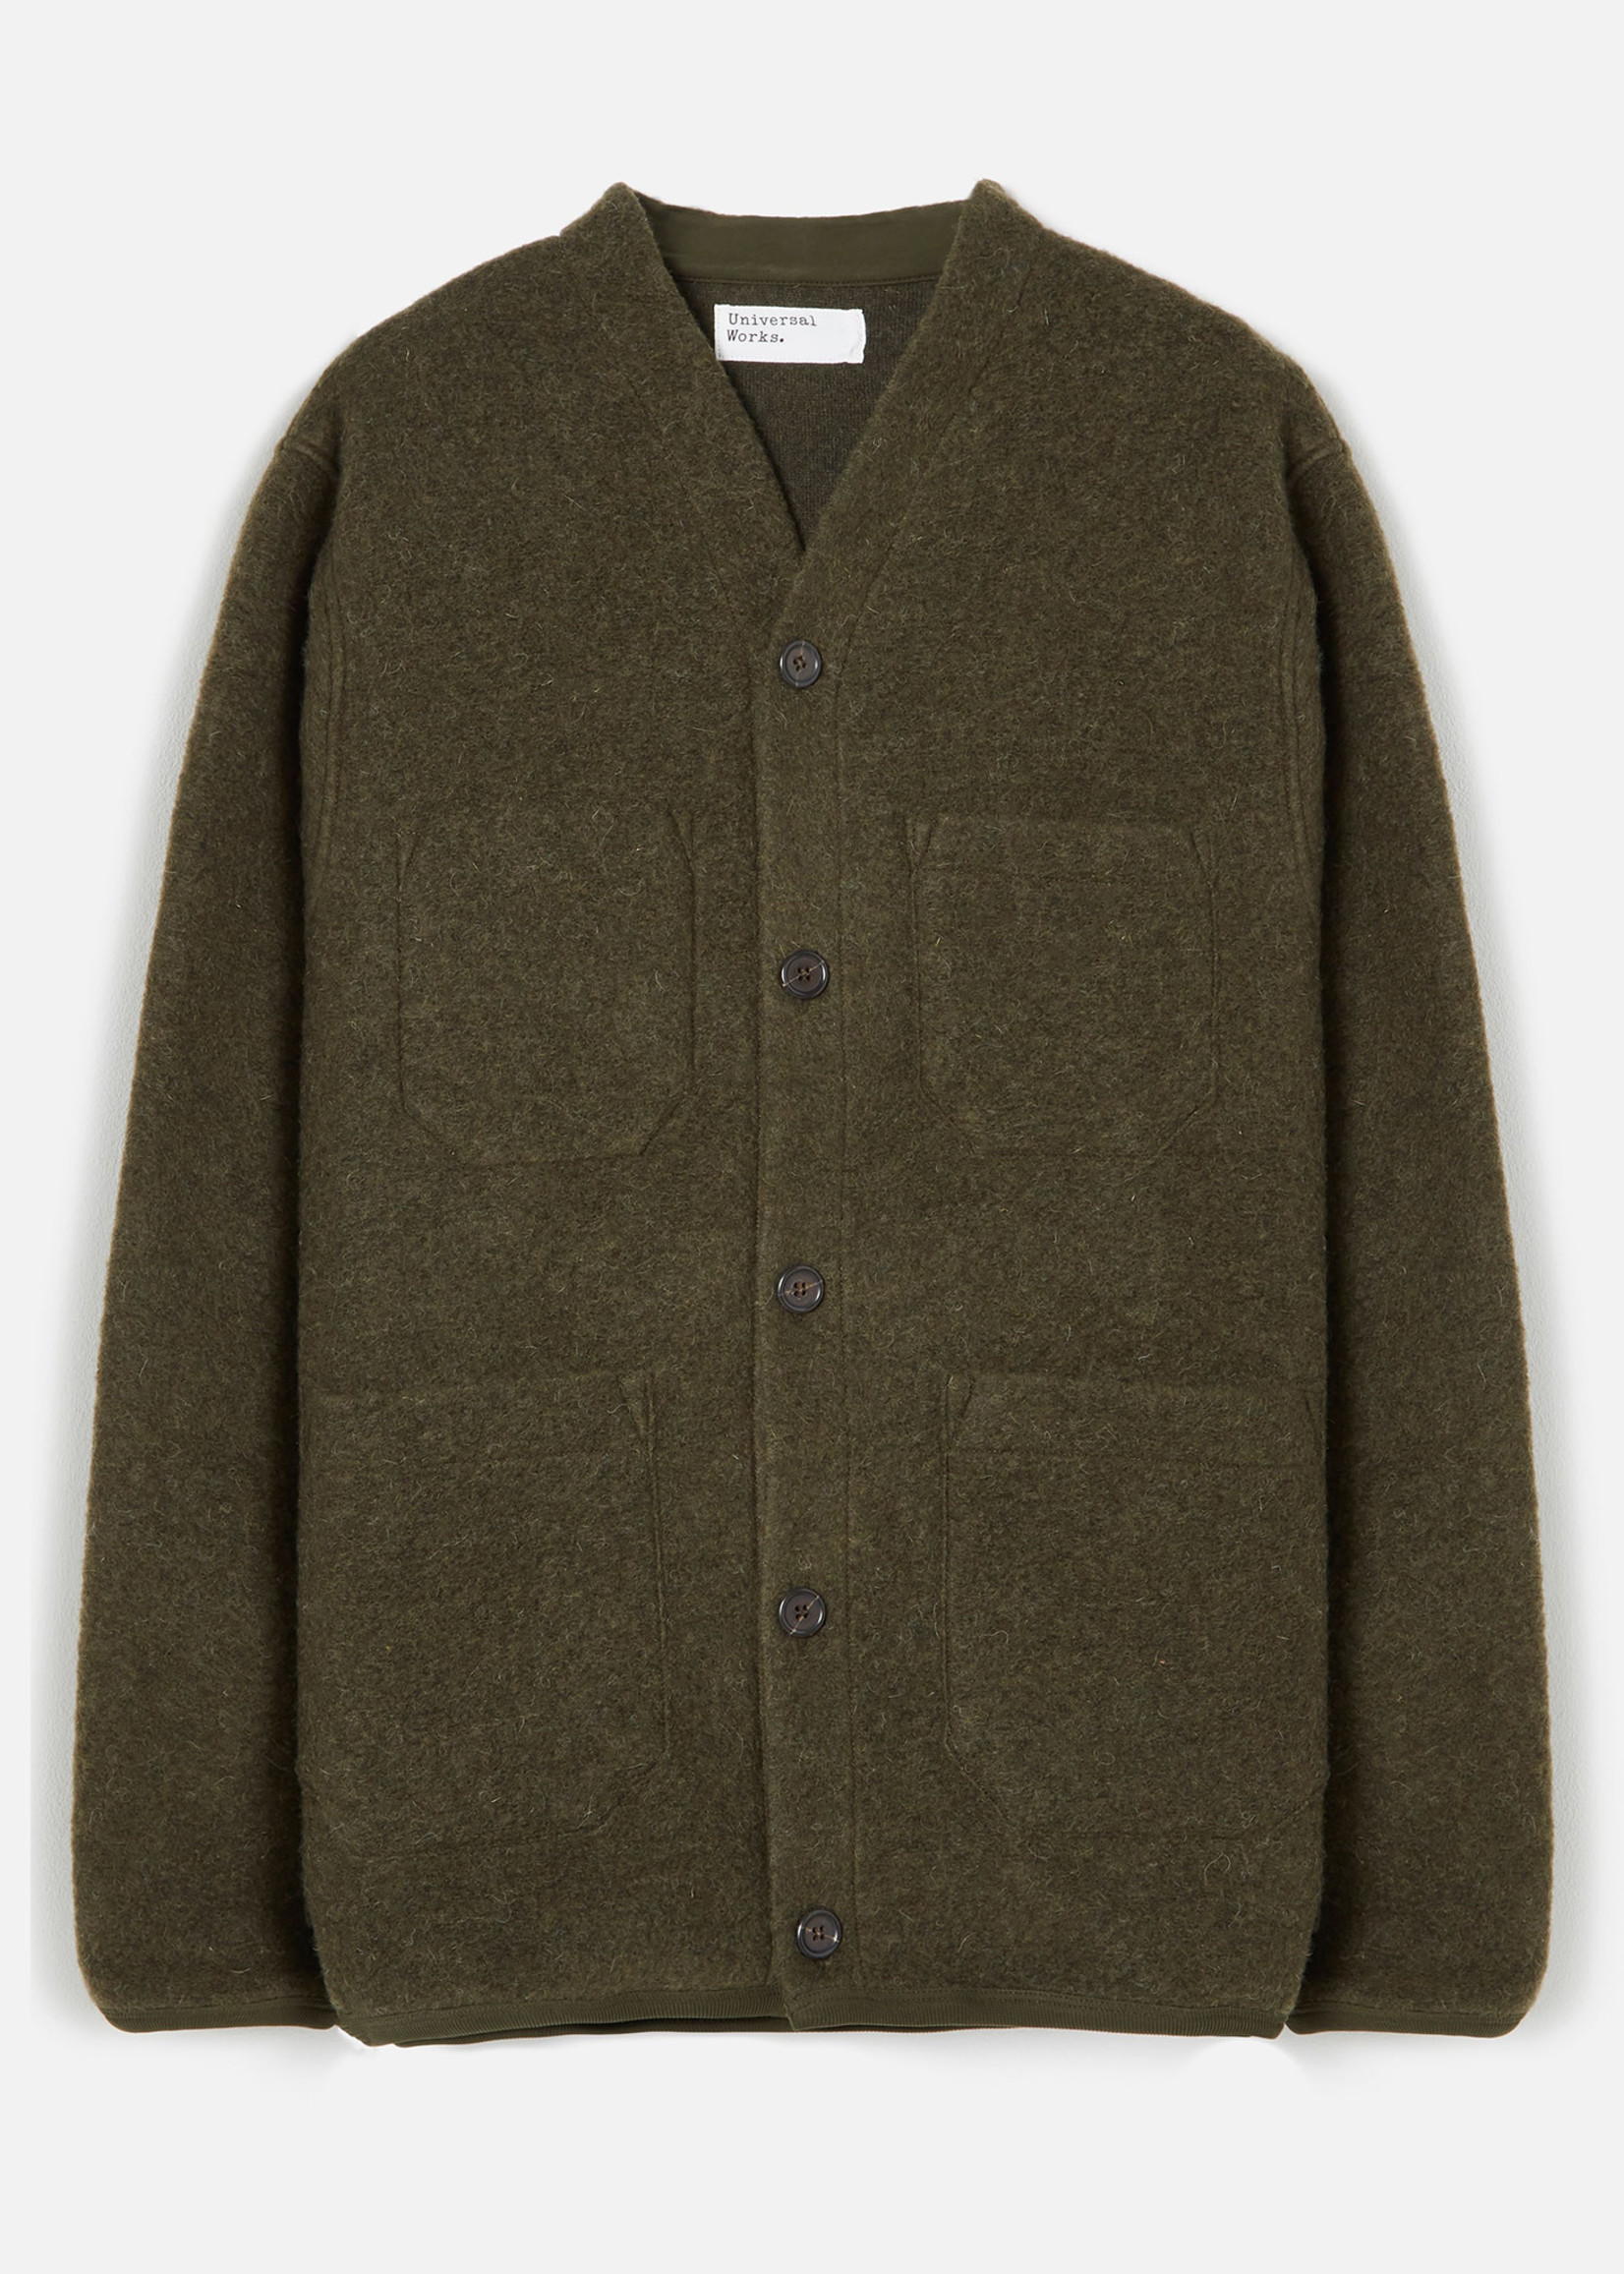 Universal Works Universal Works Cardigan Olive Wool Fleece